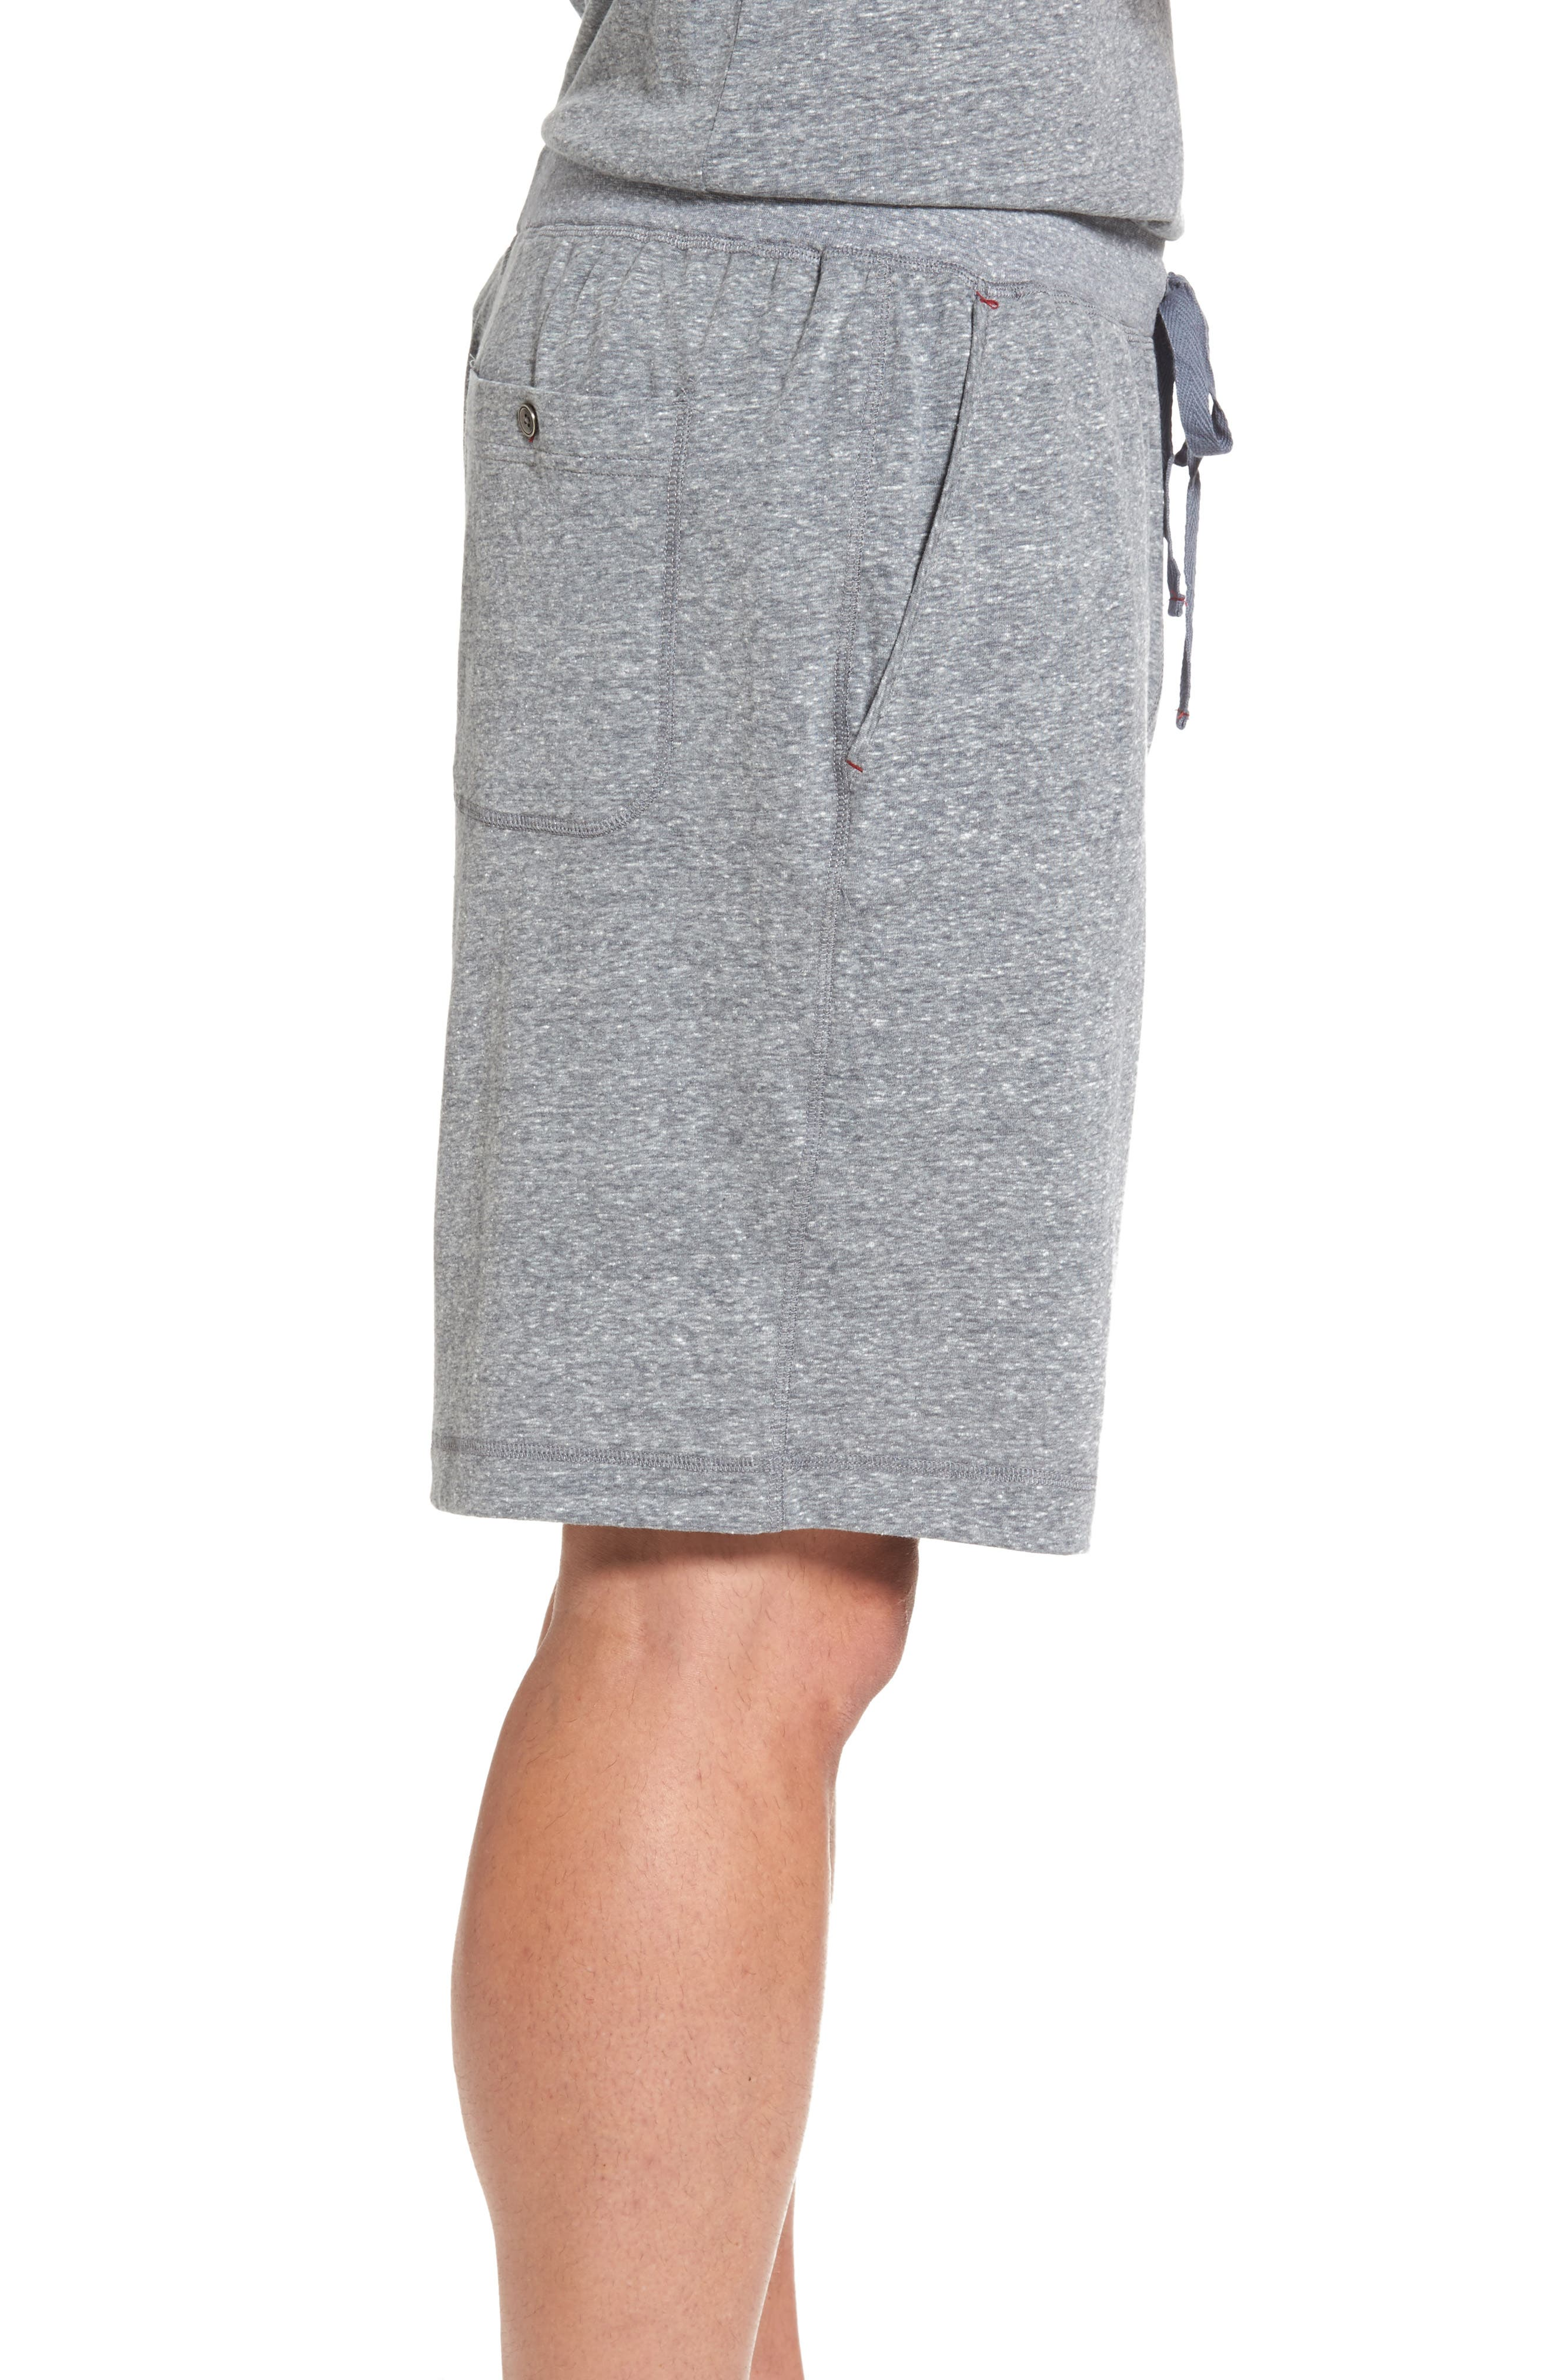 Alternate Image 3  - Daniel Buchler Lounge Shorts